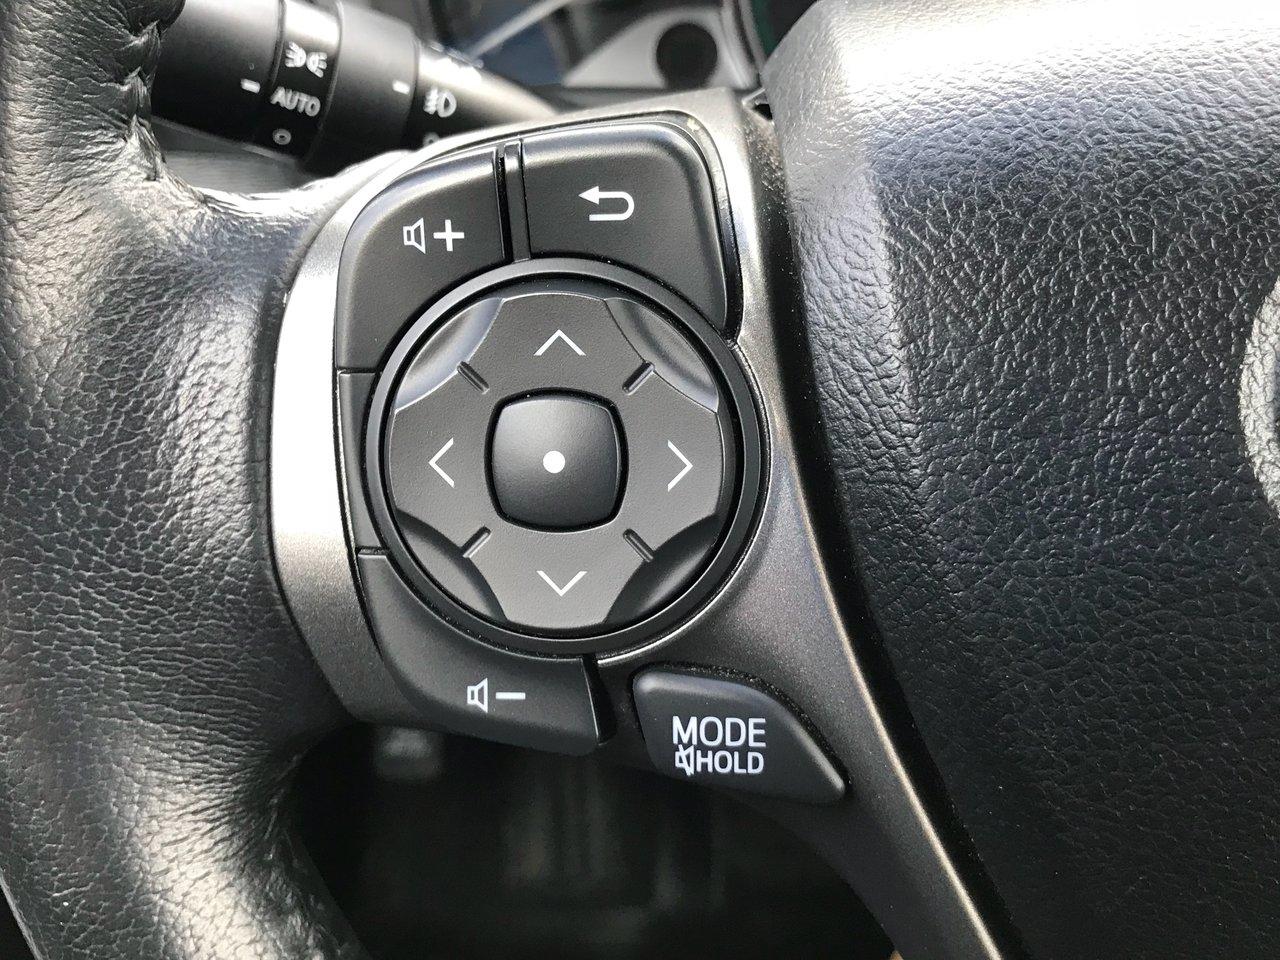 Photo 2013 Toyota Venza LEATHER! AWD! SUNROOF! HEATED SEATS! LEATHER! AWD! SUNROOF! HEATED SEATS!